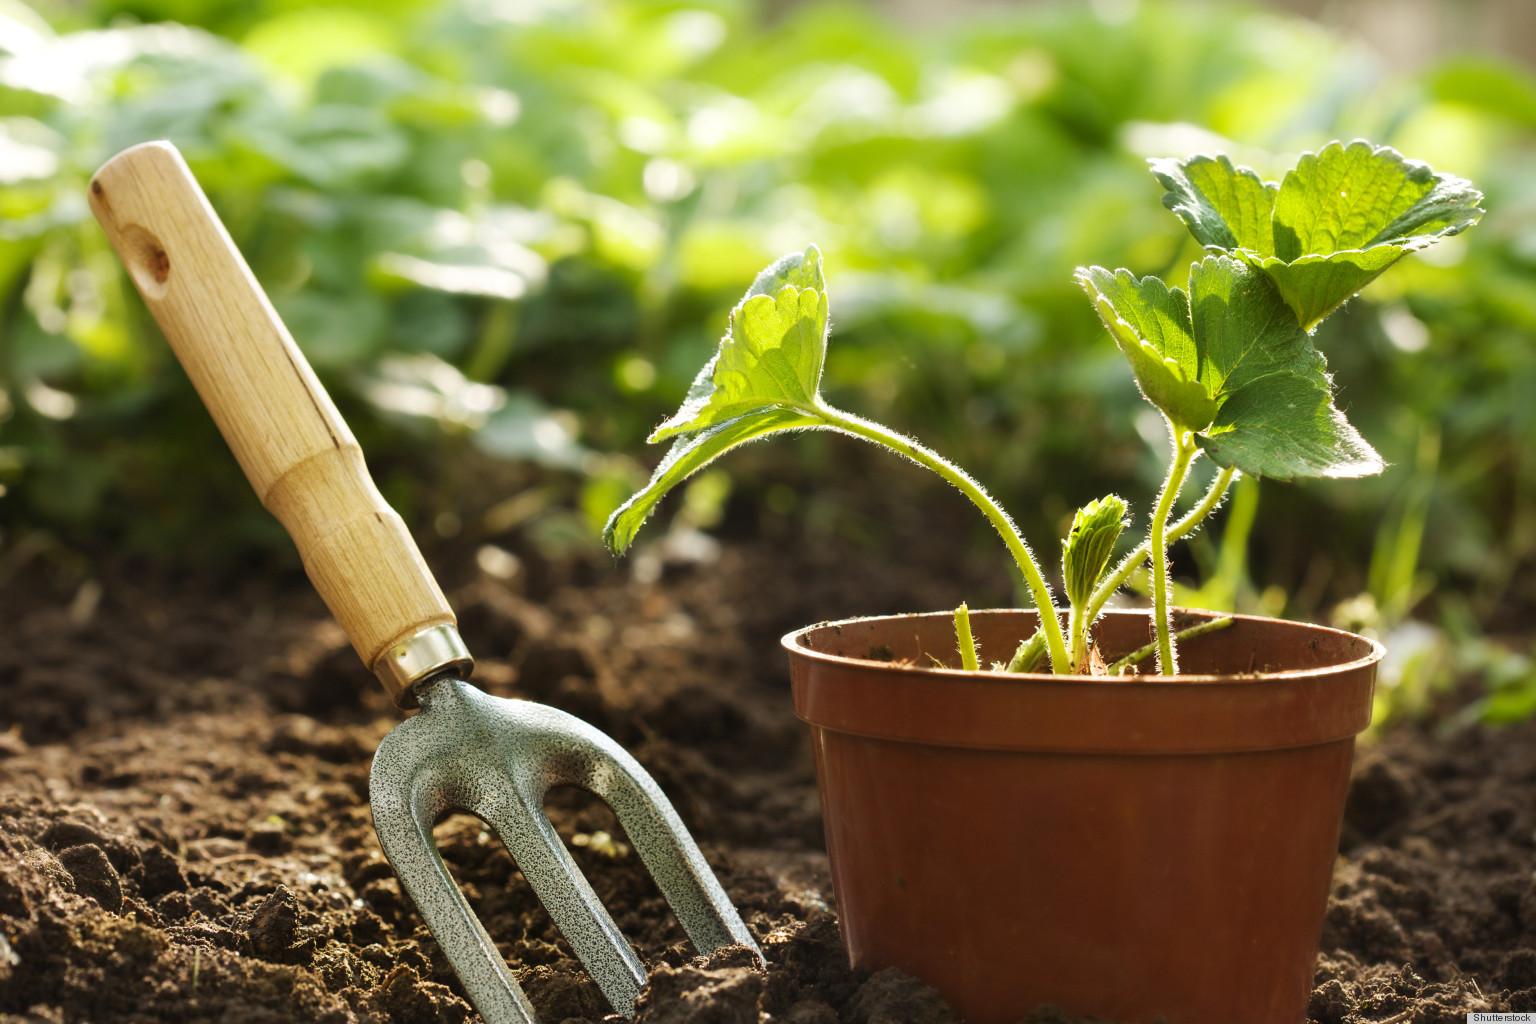 Beginner Organic Vegetable Gardening | Ottawa Public Library